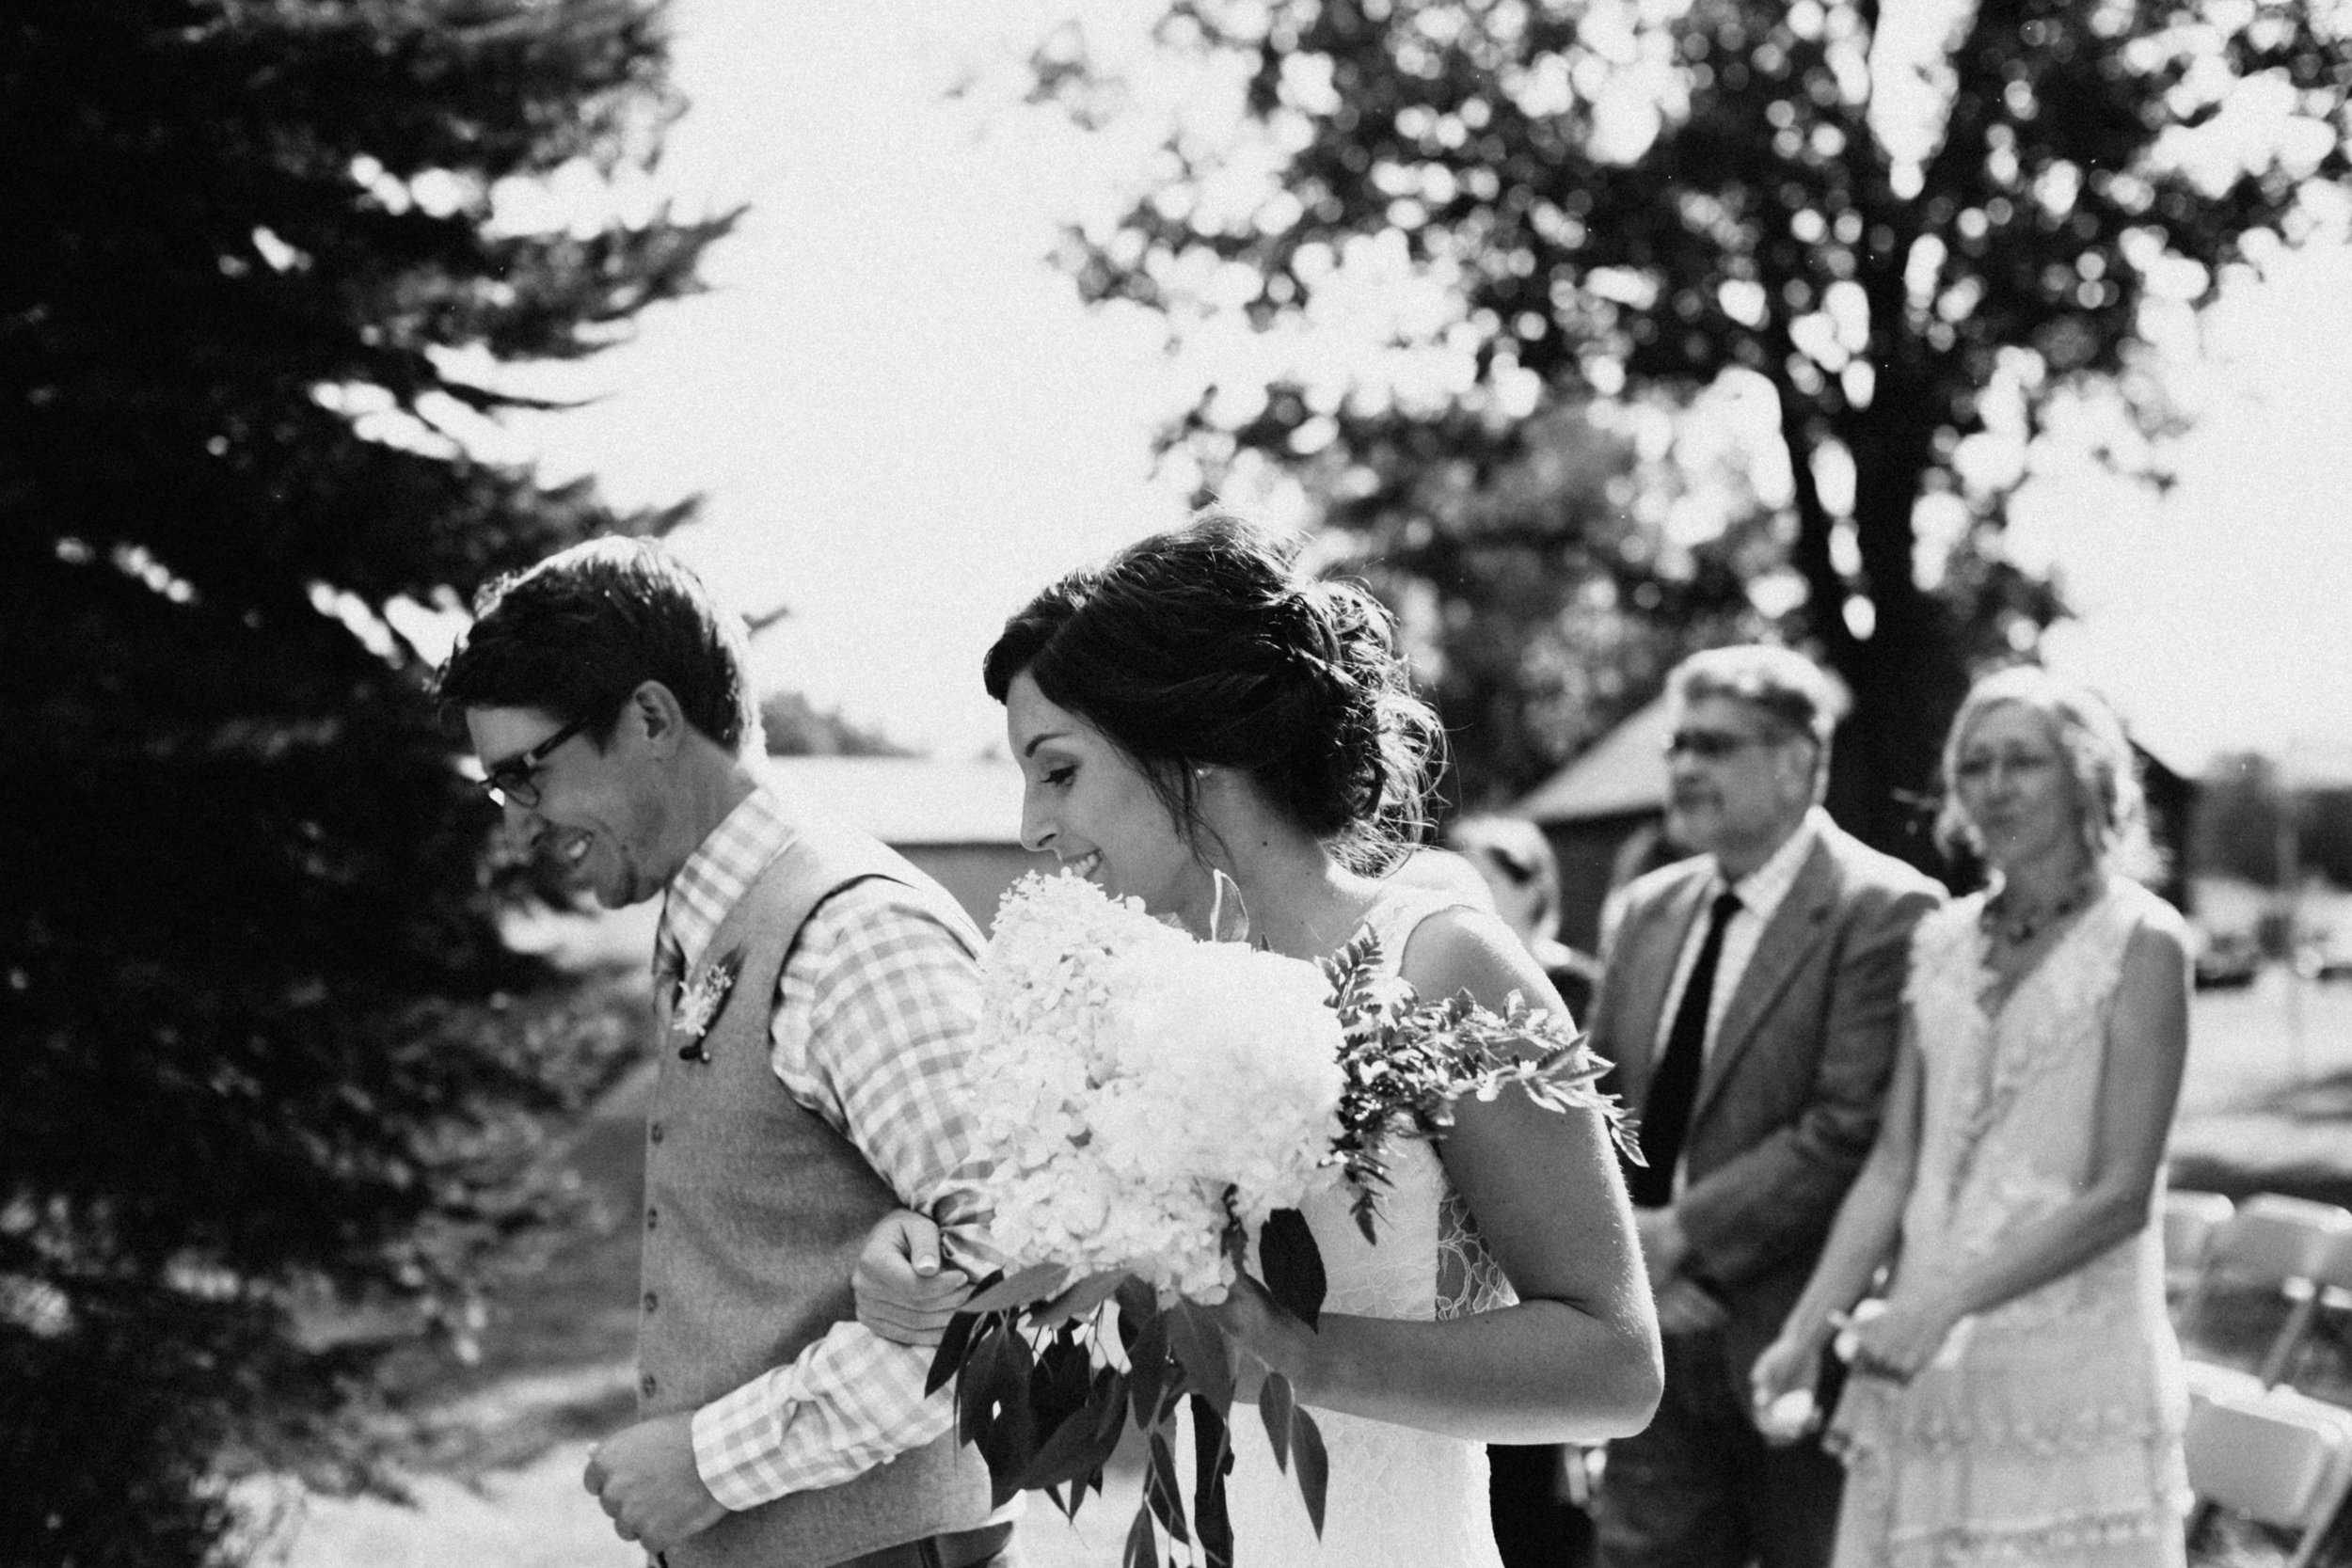 Backyard Wedding in northern Minnesota